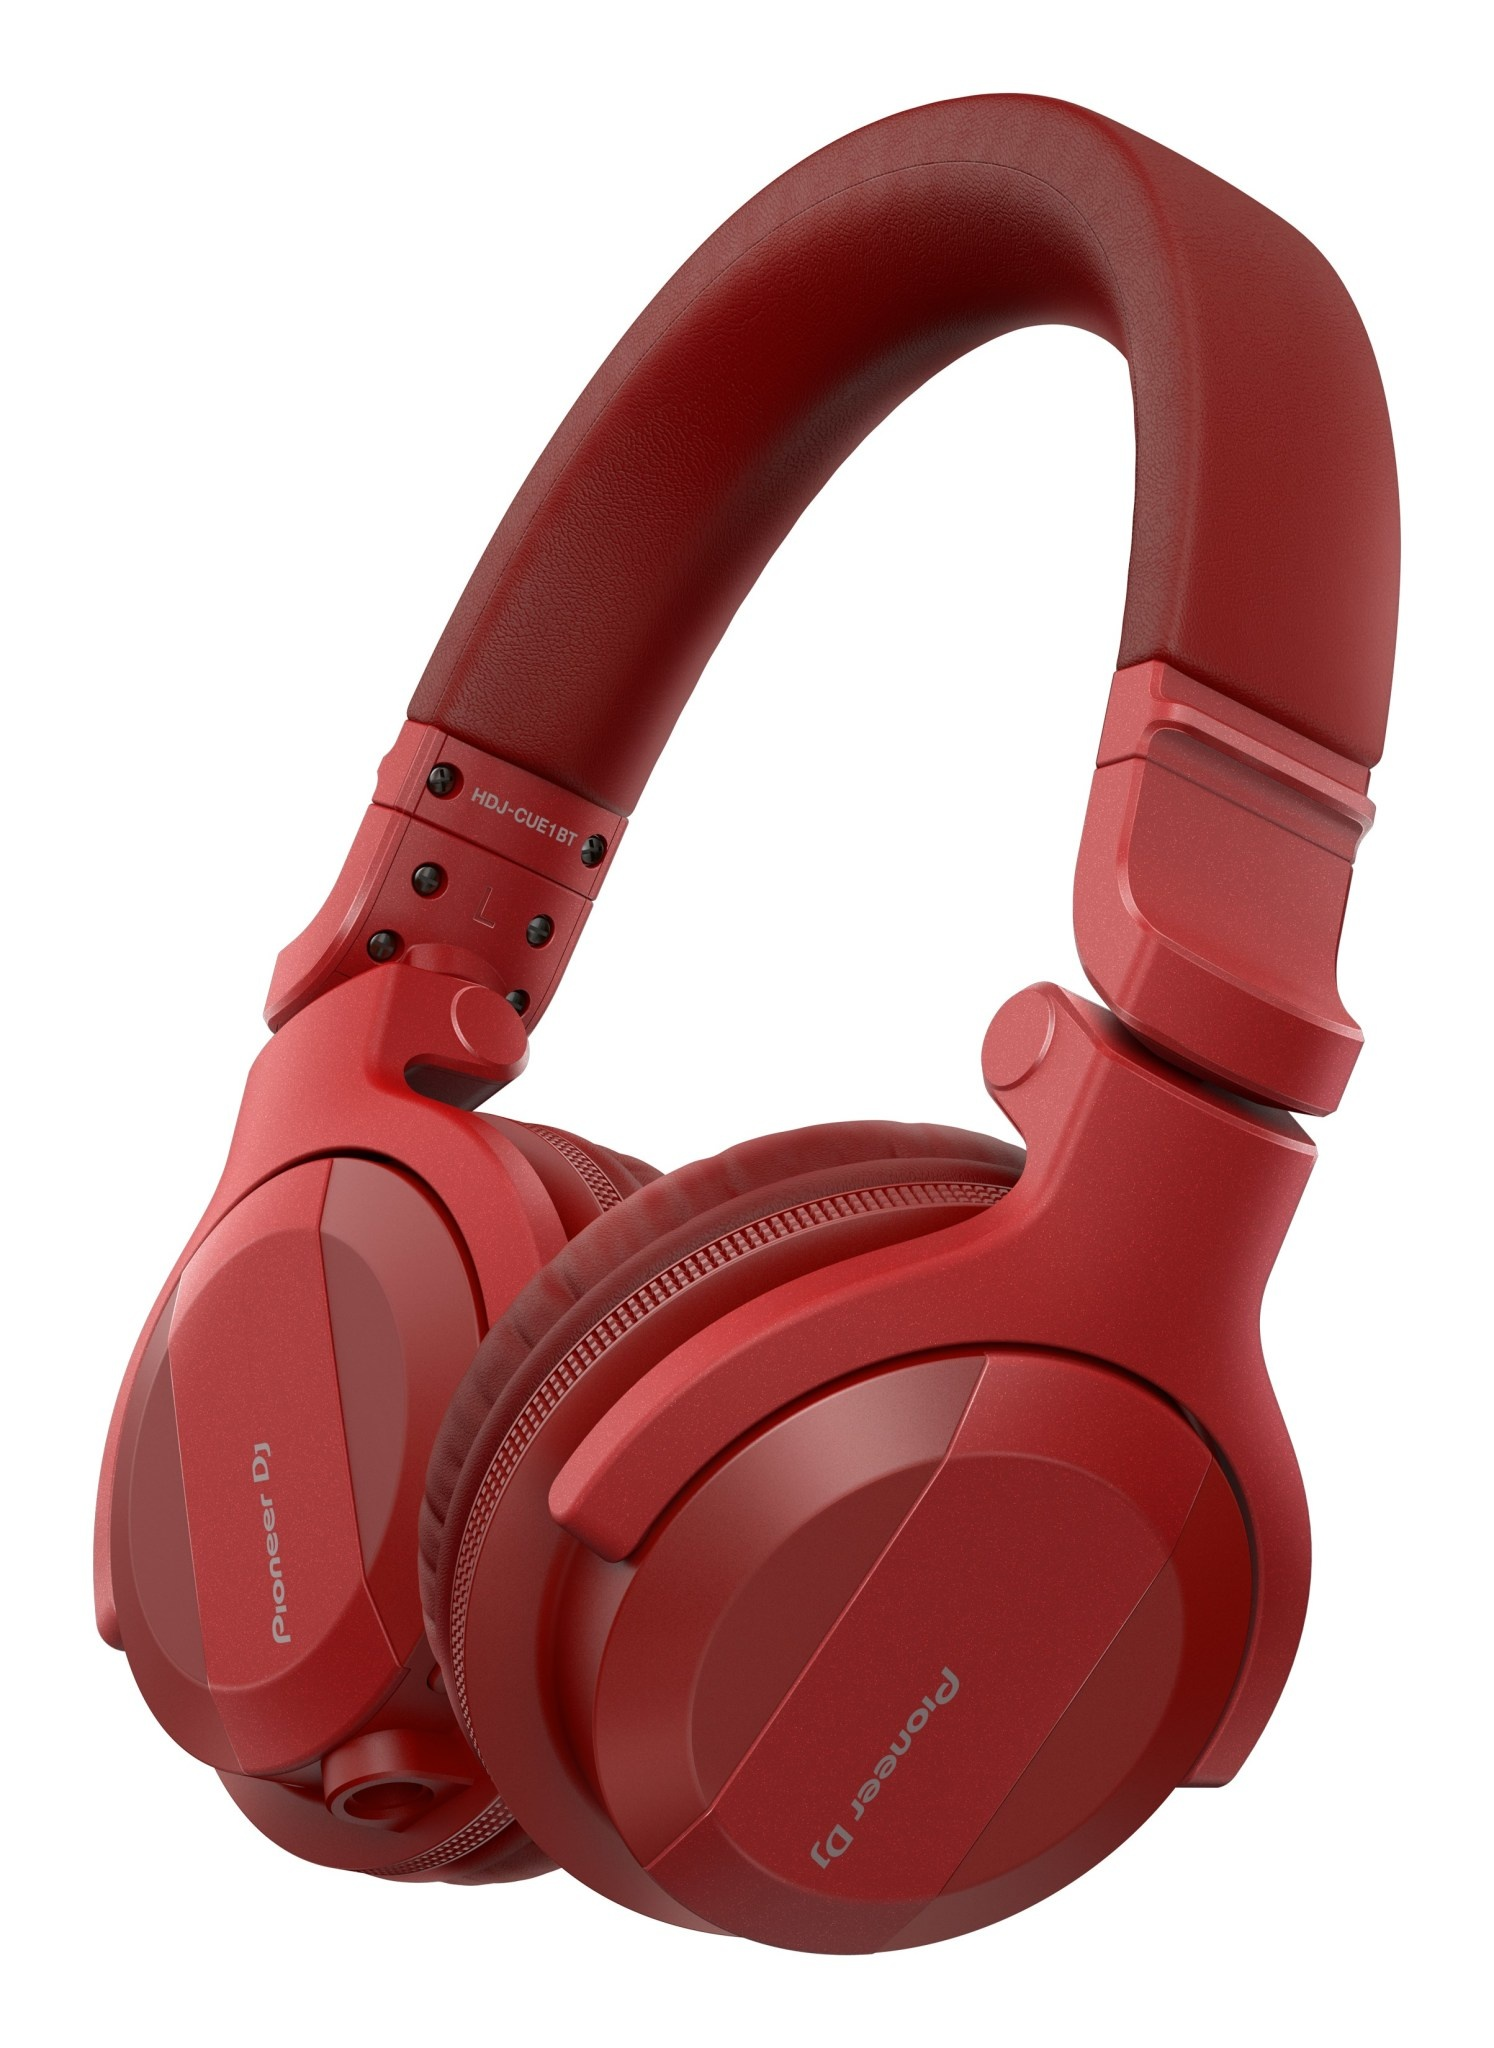 PIONEER DJ HDJ-CUE1BT-R PIONEER DJ